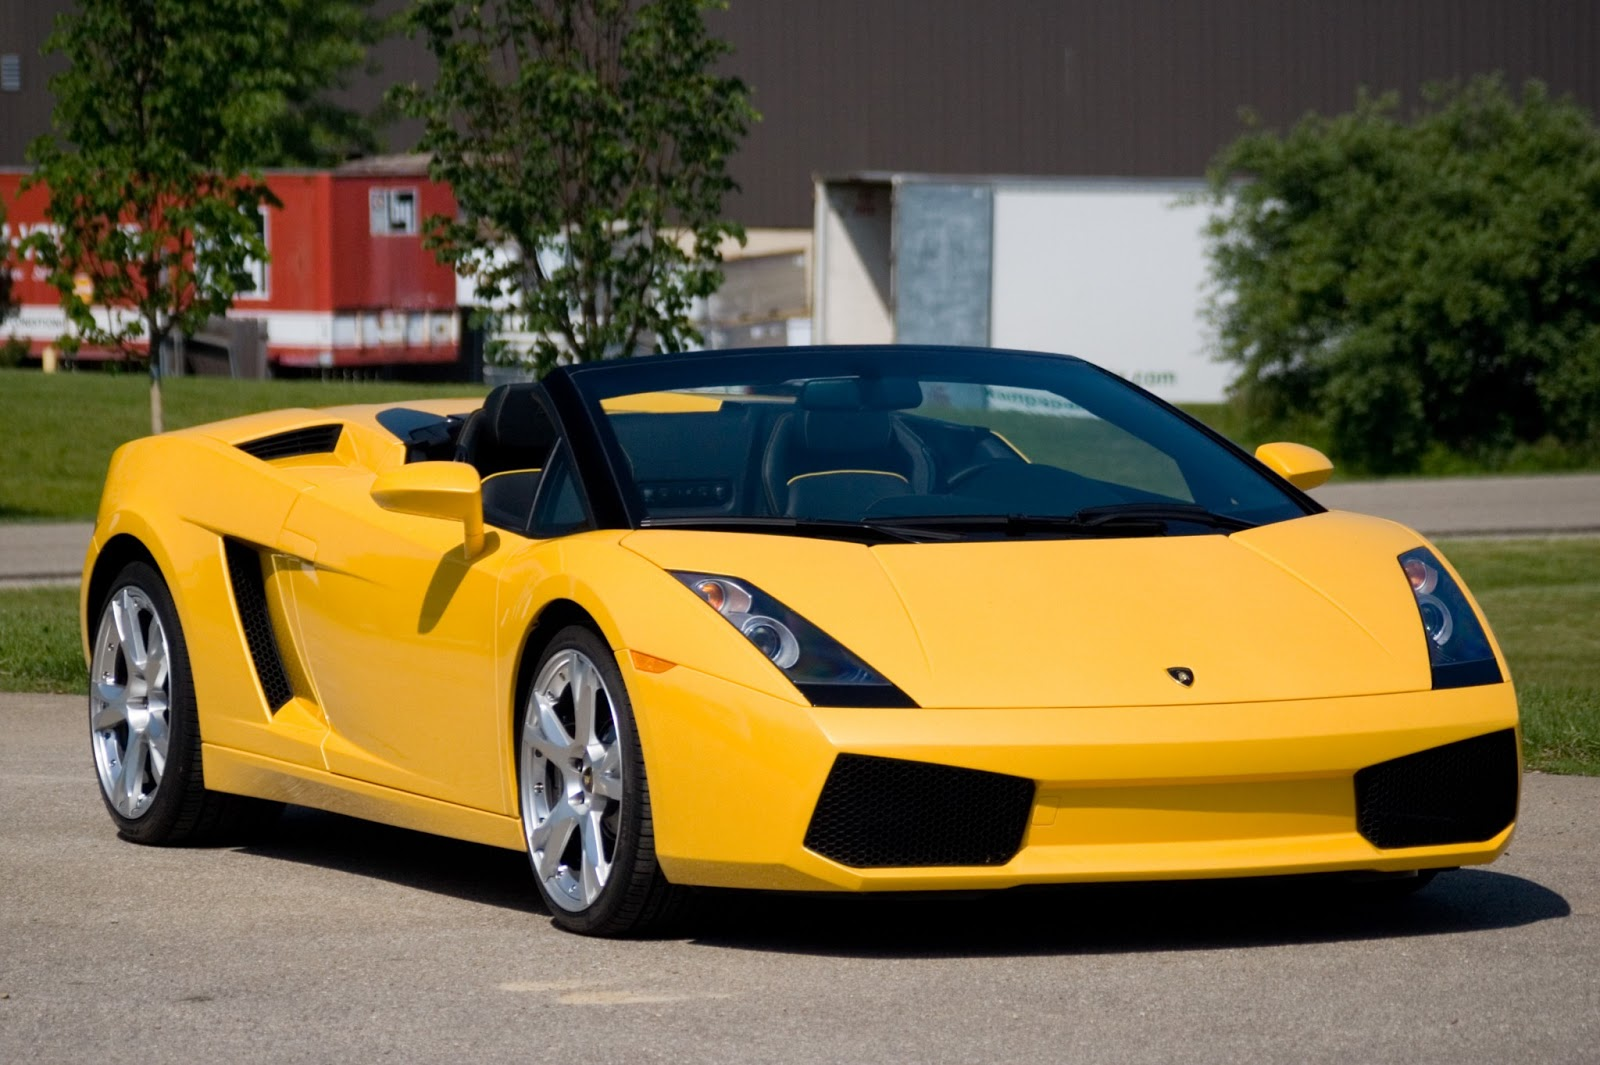 Luxury Lamborghini Cars: Lamborghini Gallardo Spyder